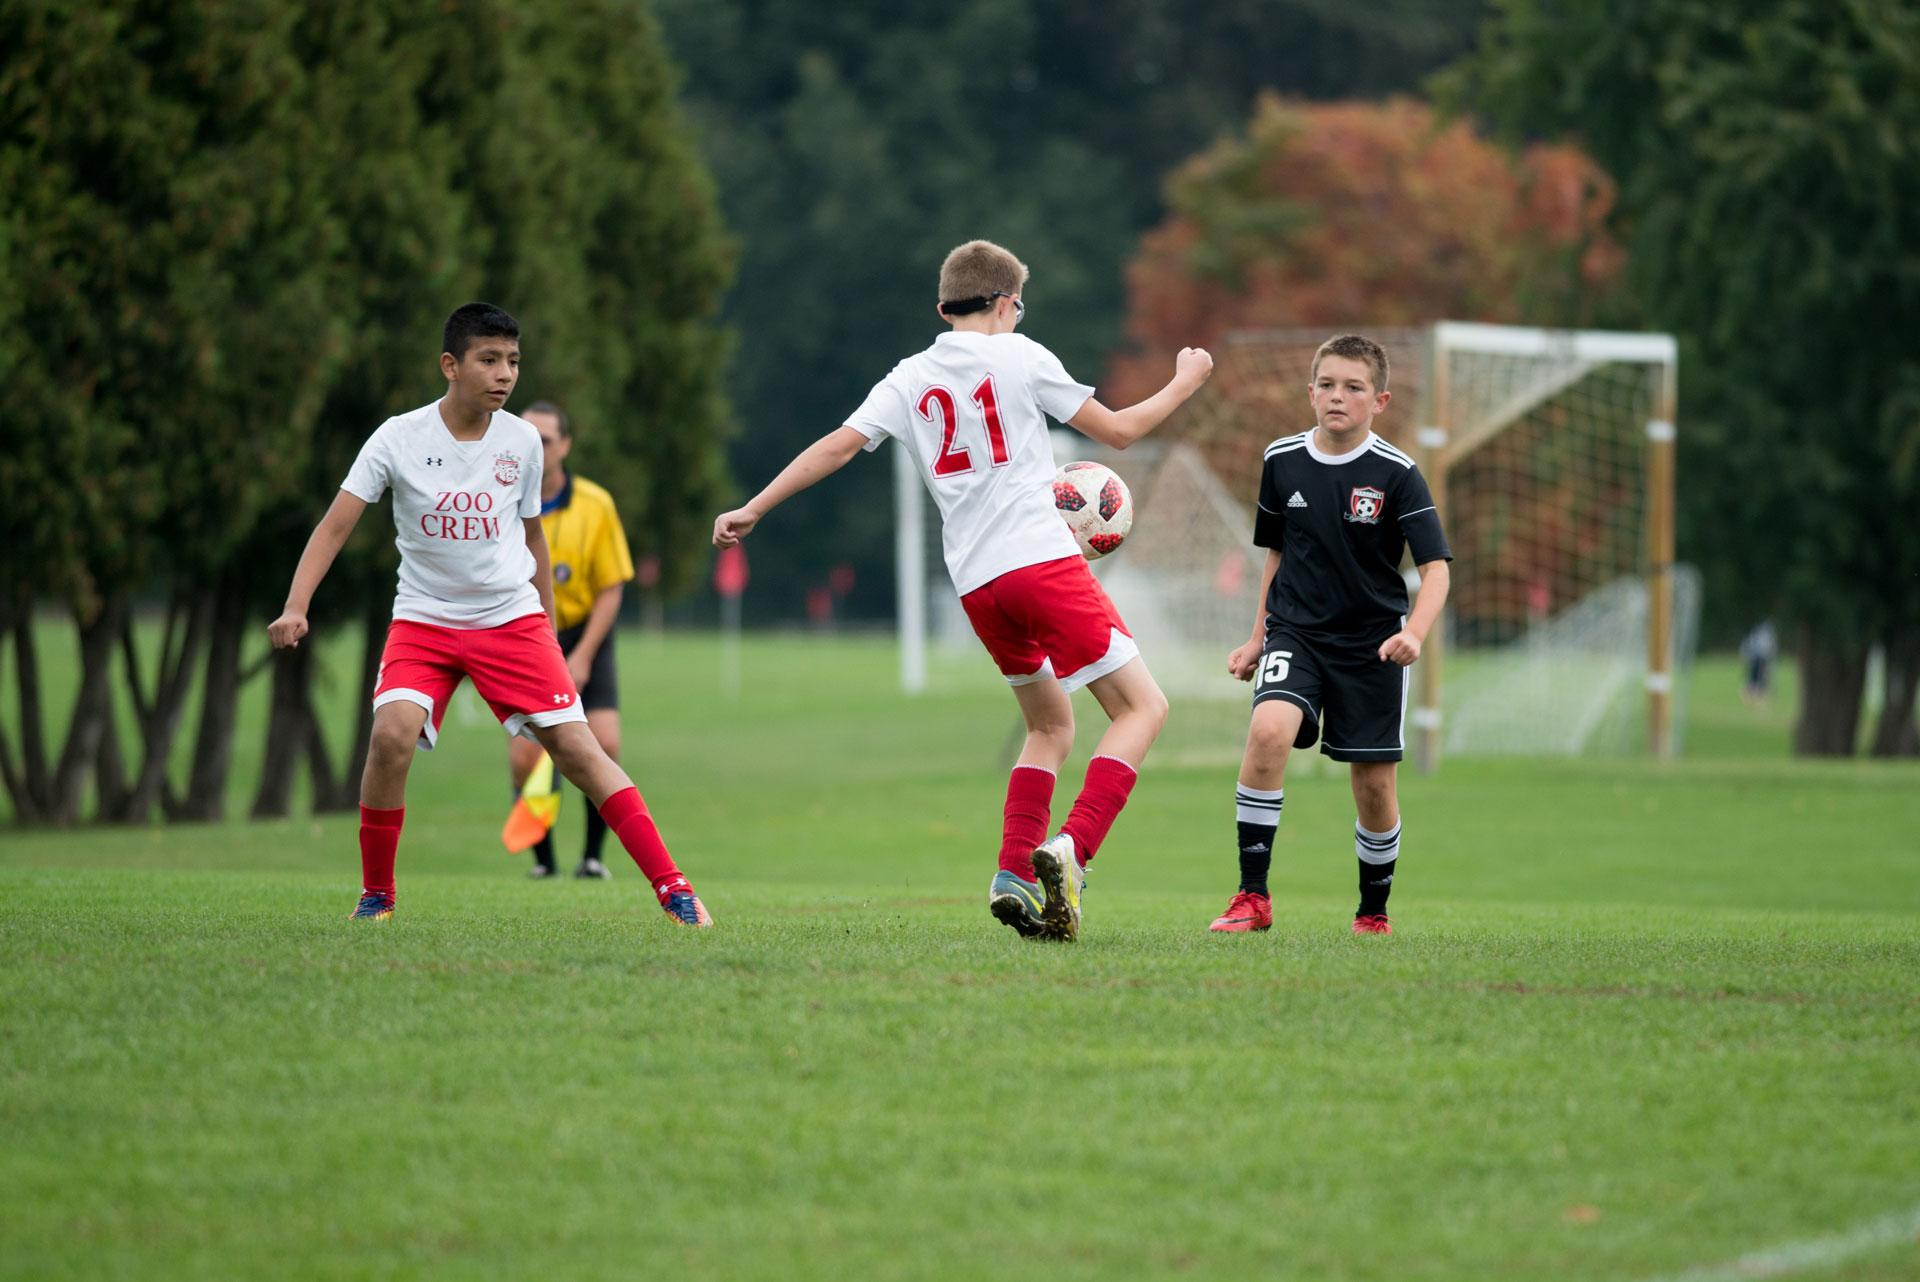 Youth — Kalamazoo Soccer Club